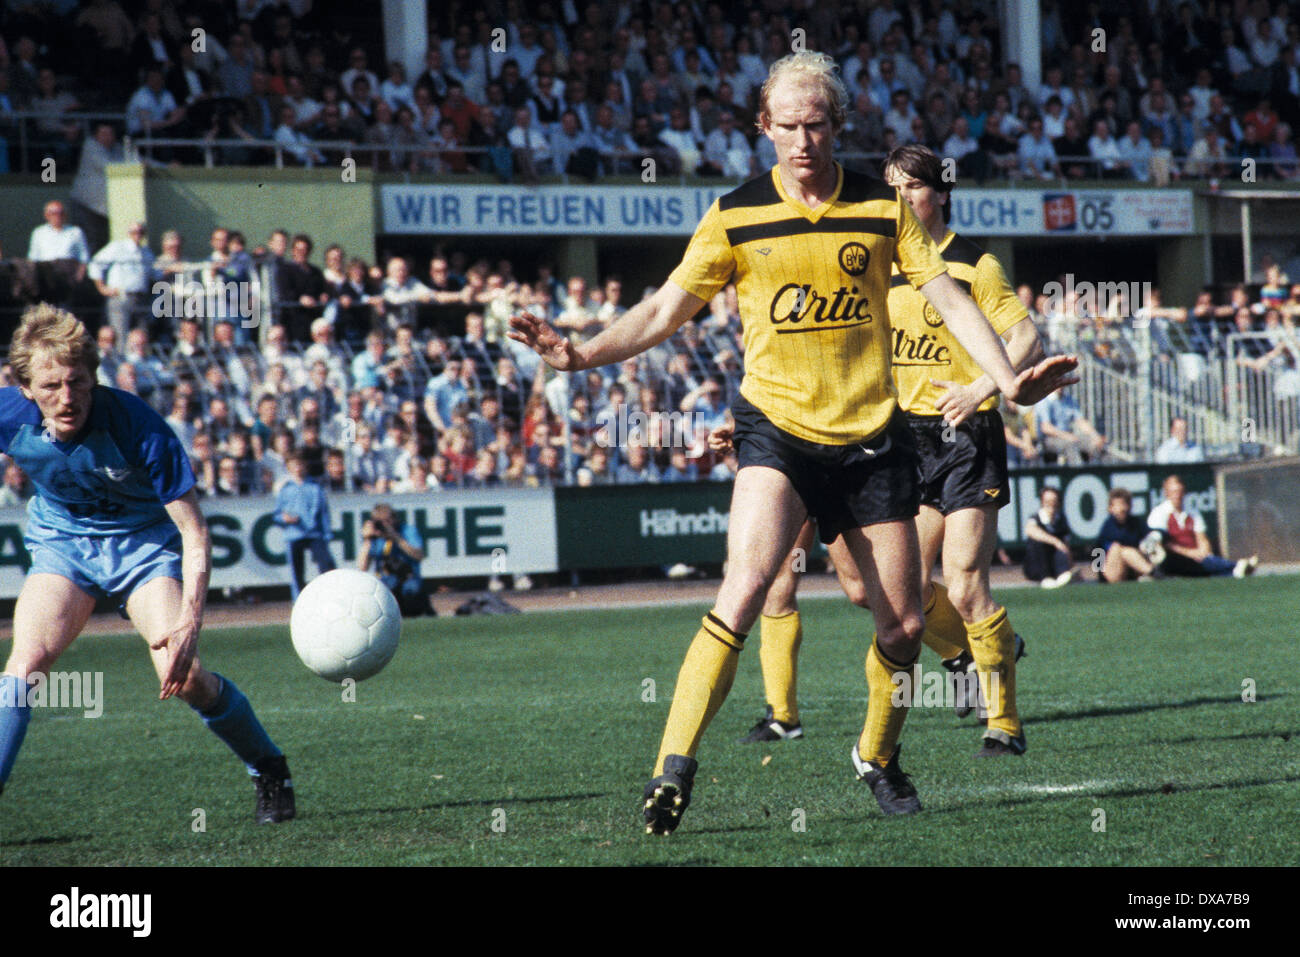 football, Bundesliga, 1983/1984, Grotenburg Stadium, FC Bayer 05 Uerdingen versus Borussia Dortmund 2:1, scene of the match, Rolf Ruessmann (BVB), left Peter Loontiens (Bayer) - Stock Image